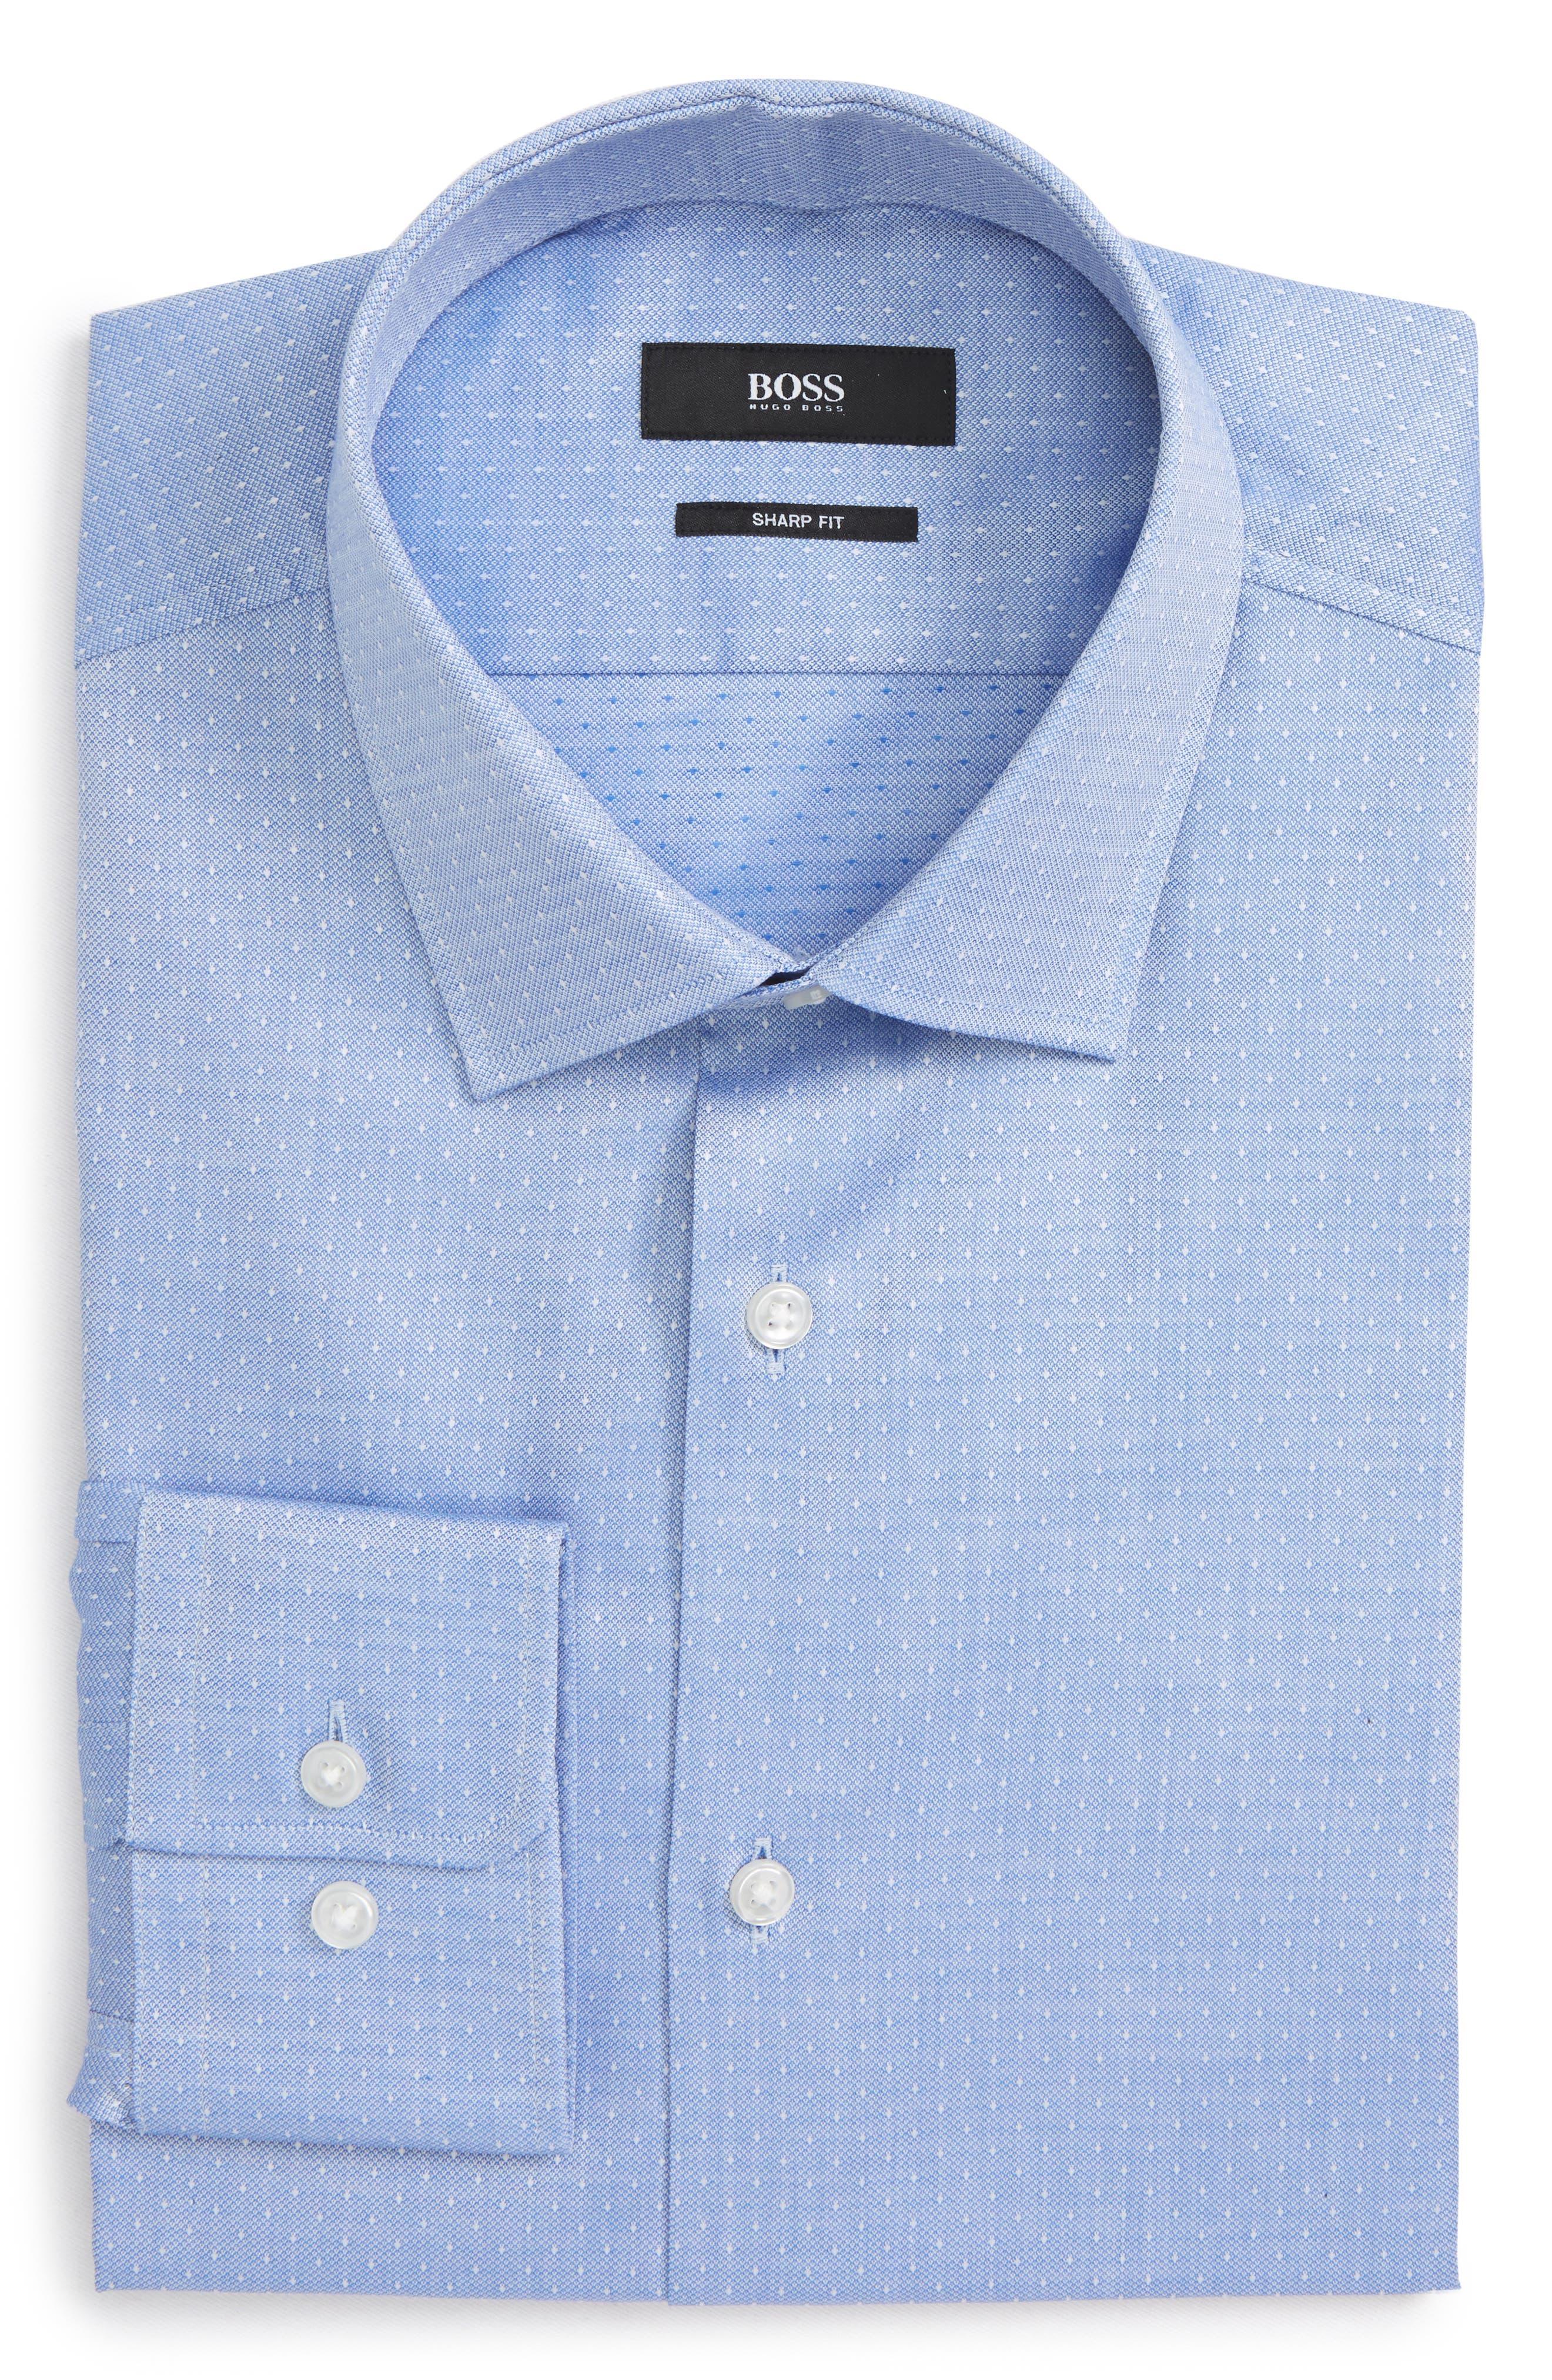 Mark Sharp Fit Dress Shirt,                         Main,                         color, 430